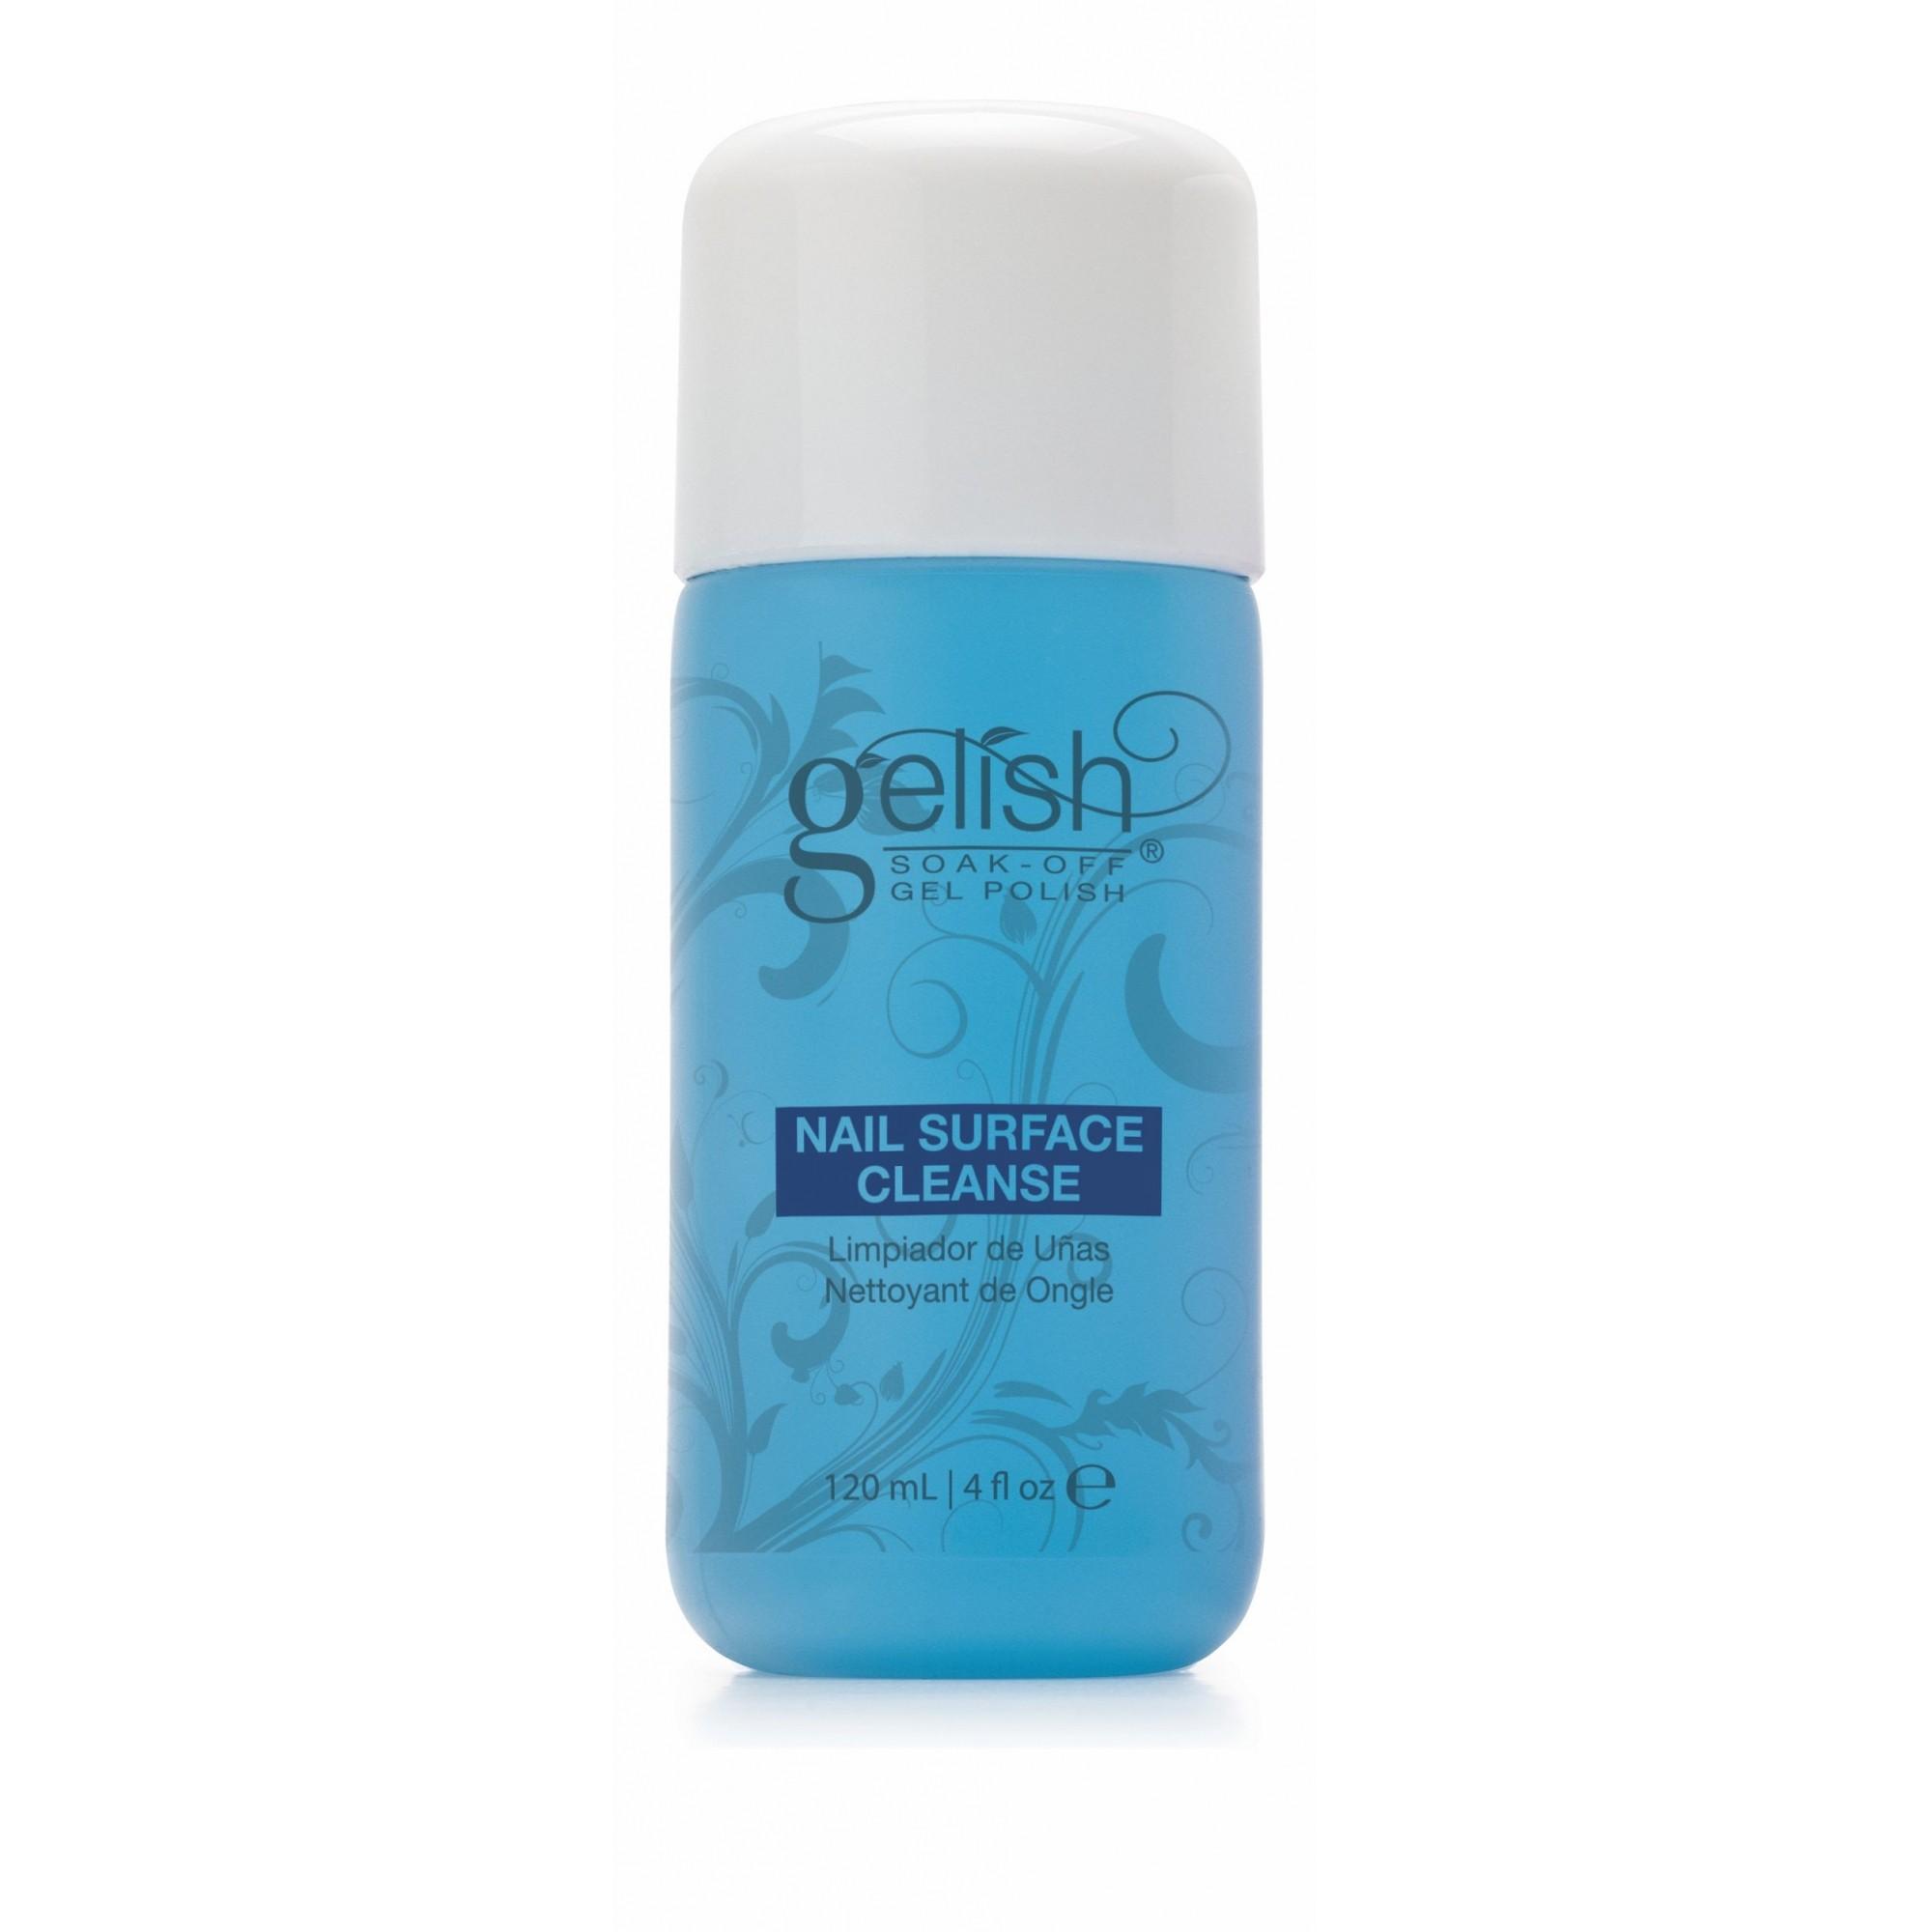 Gelish Nail Cleanse Harmony 120ml